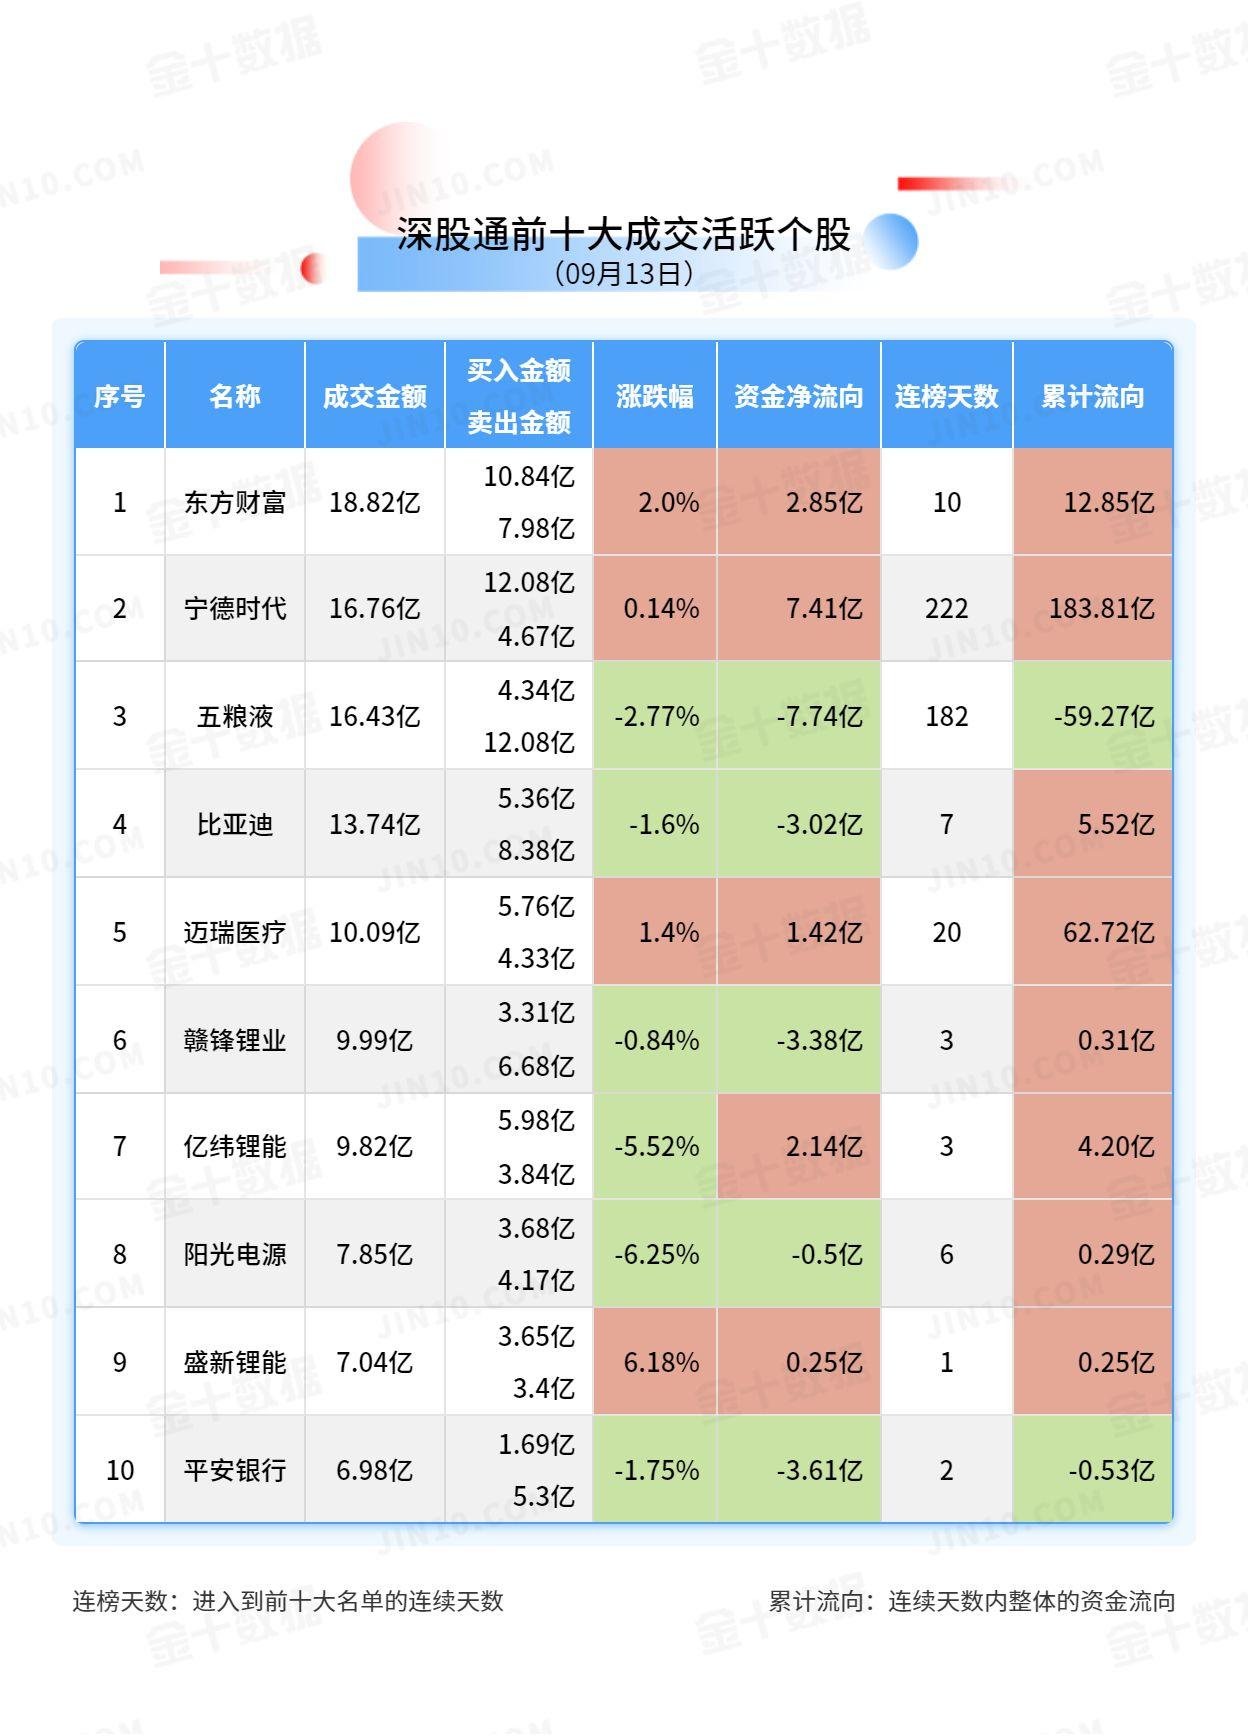 pta模拟投资_ 【北向资金大单买入报告】五粮液获净卖出7.74亿元 (http://www.0769sy.net/) 国际期货 第3张